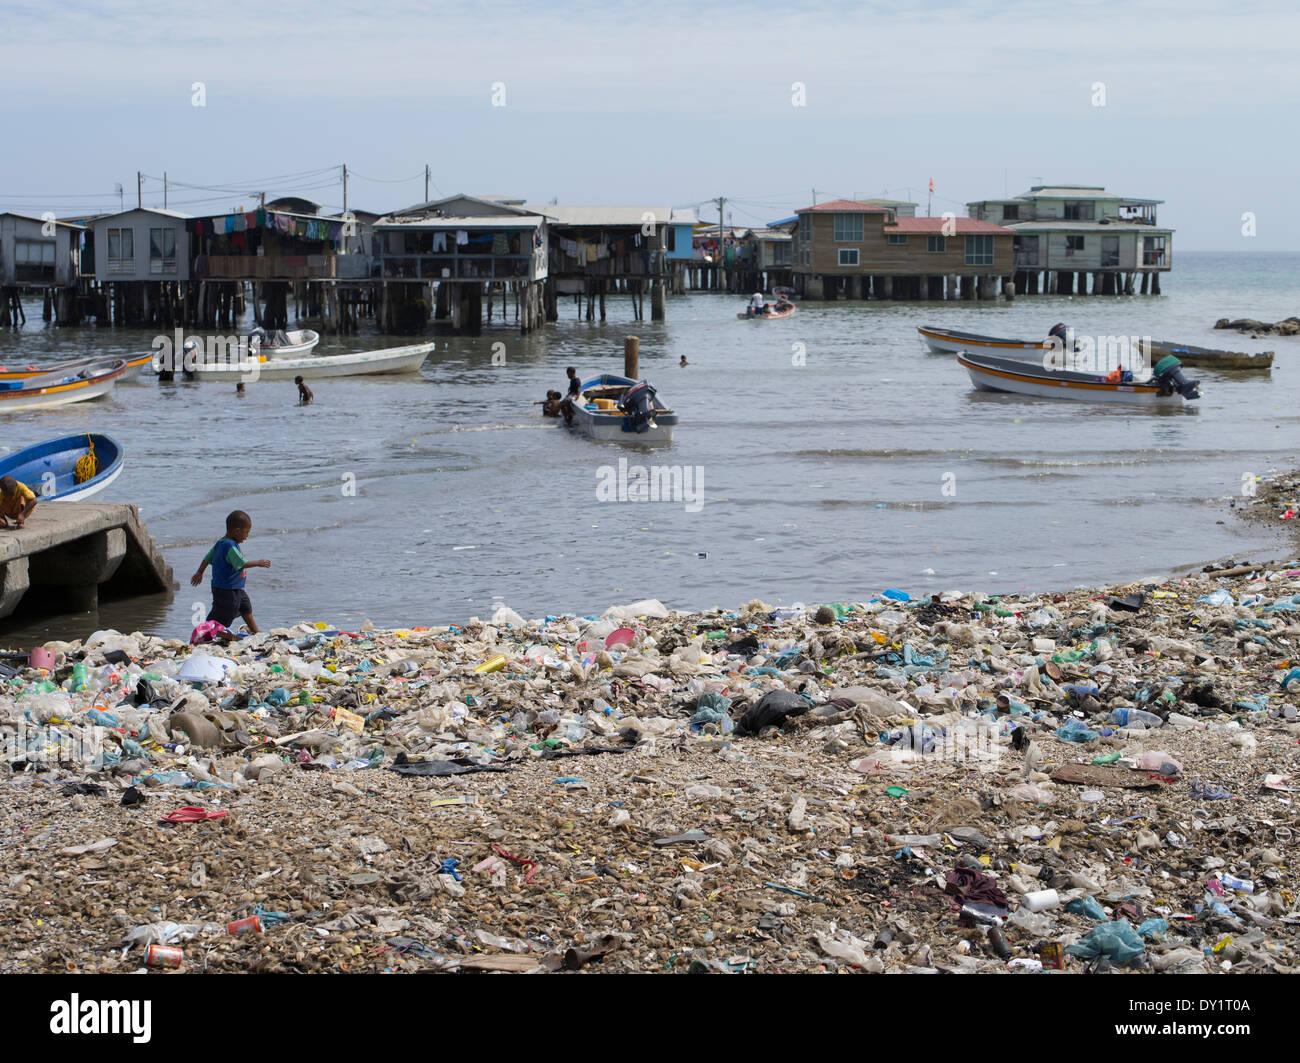 Trash / garbage  surrounding the Stilt village of Koki , Port Moresby, Papua New Guinea - Stock Image